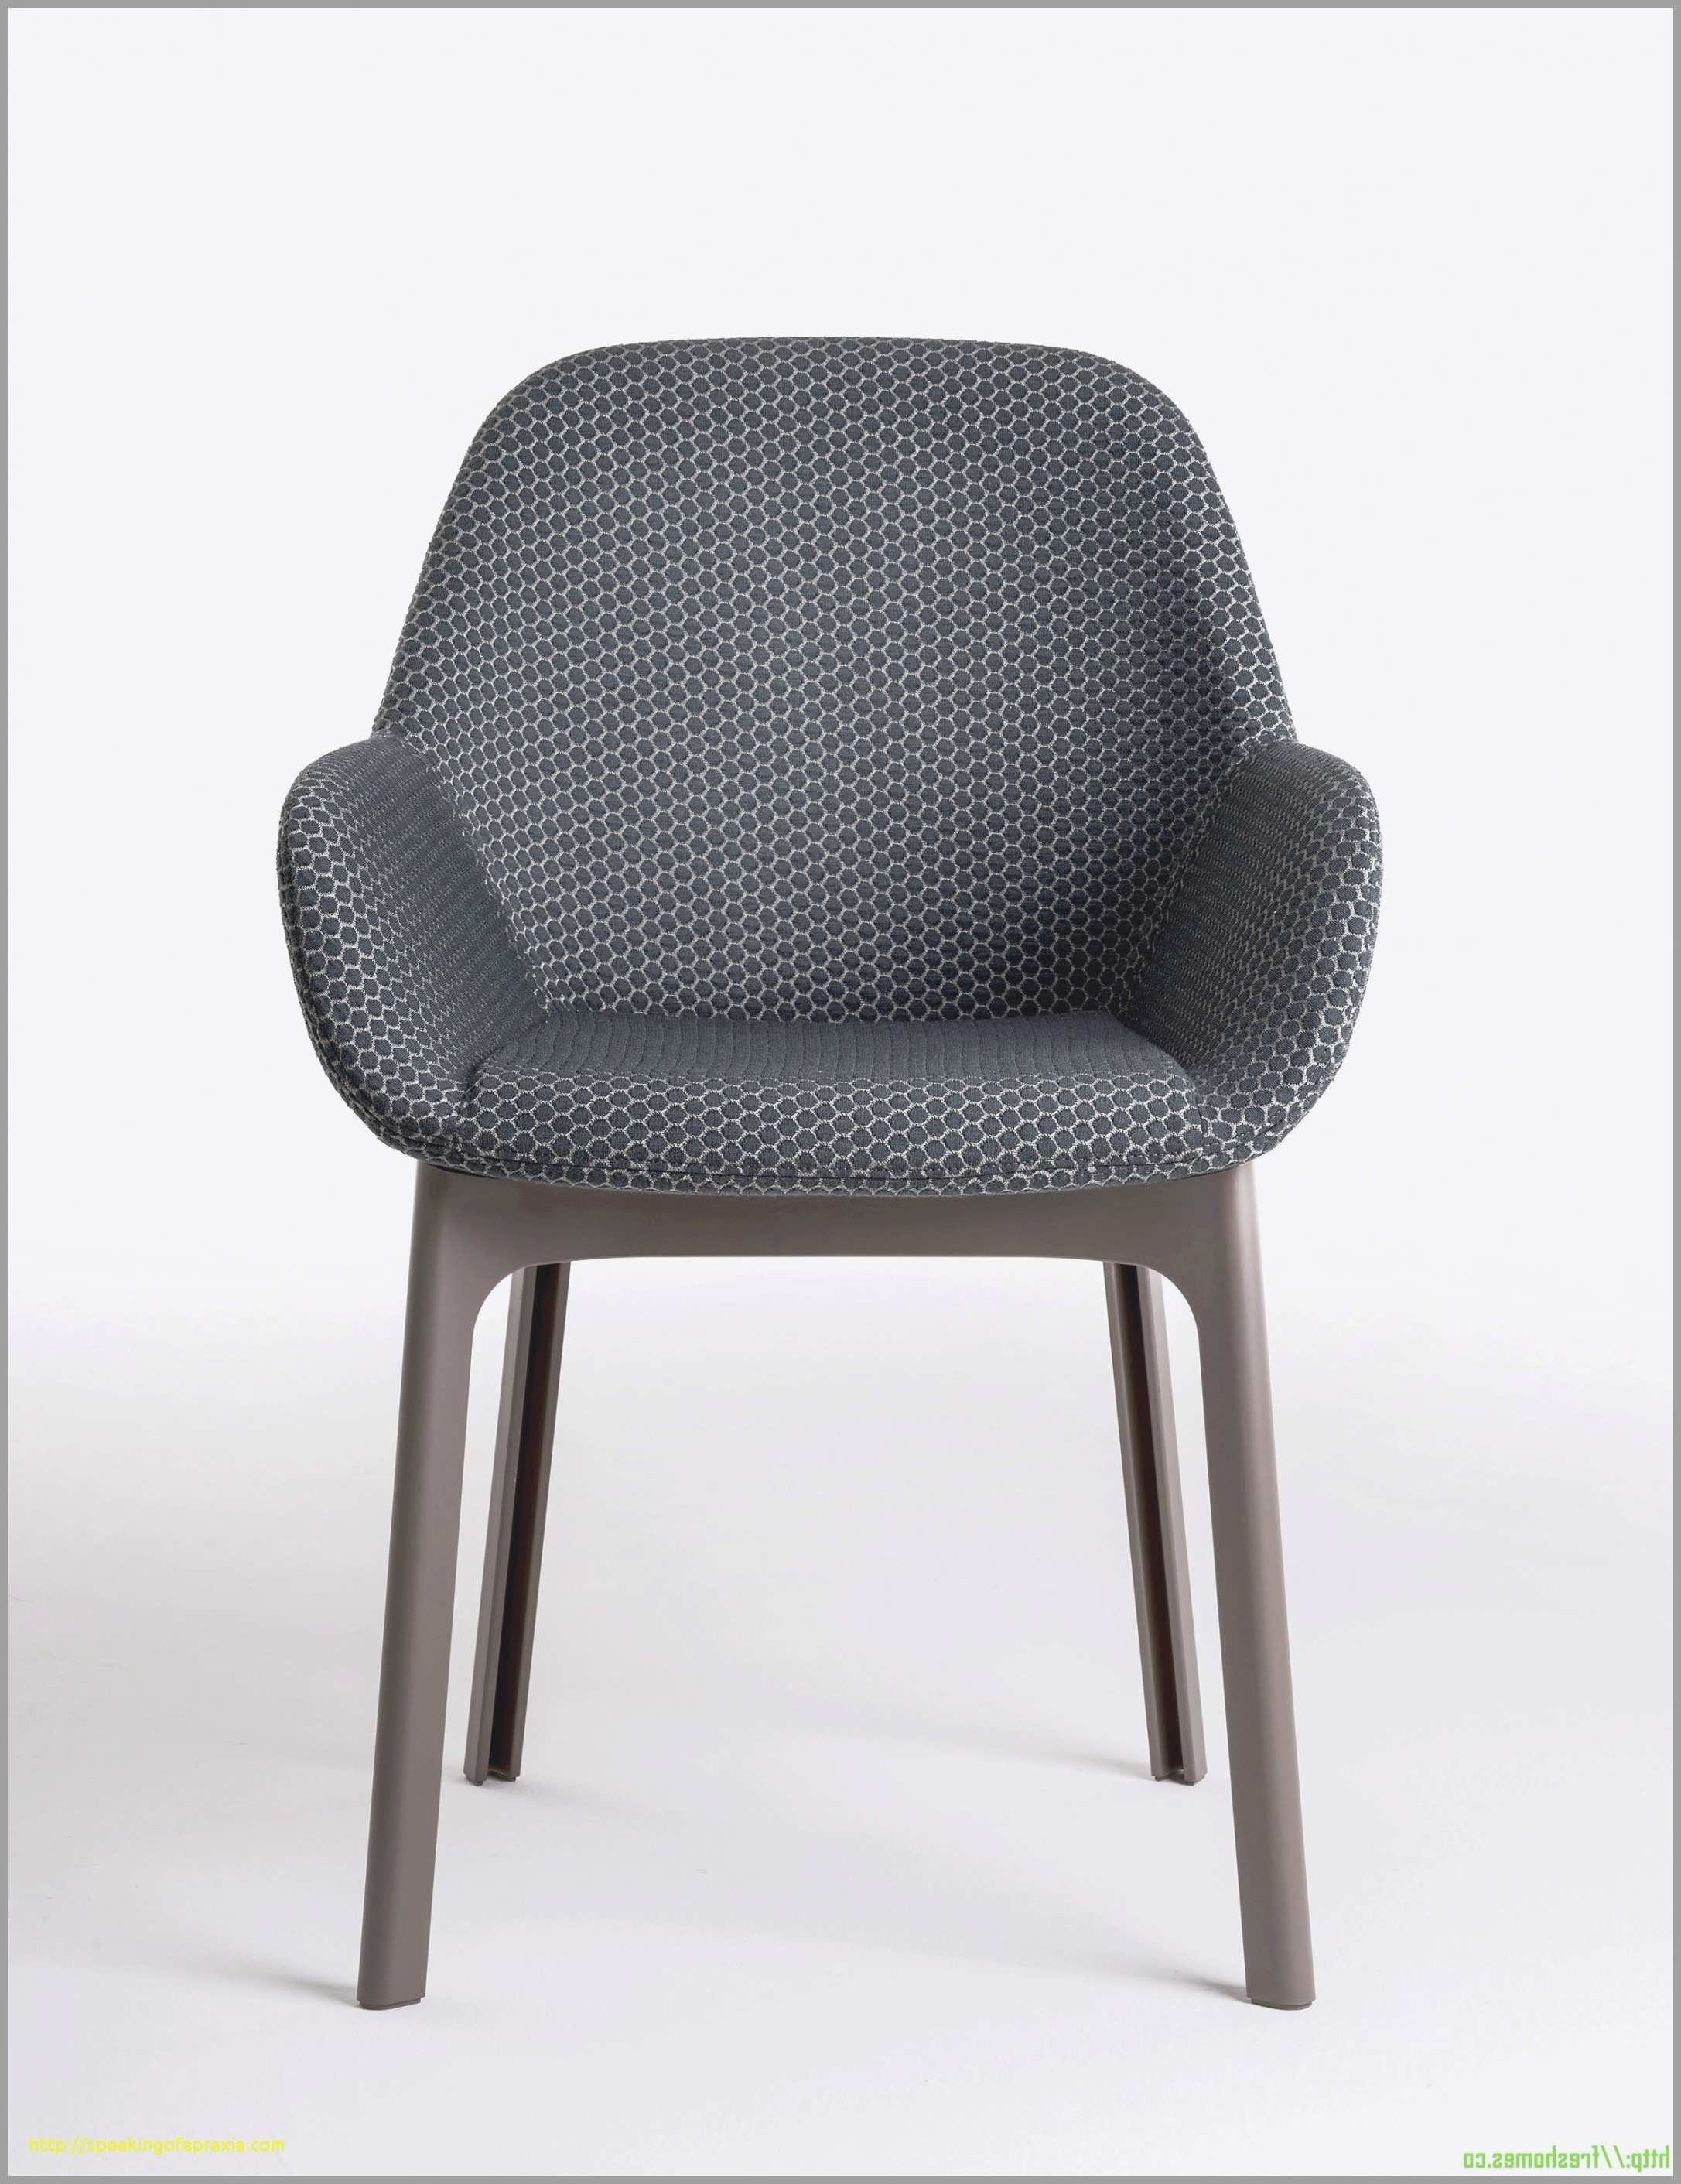 Chaise scandinave framboise